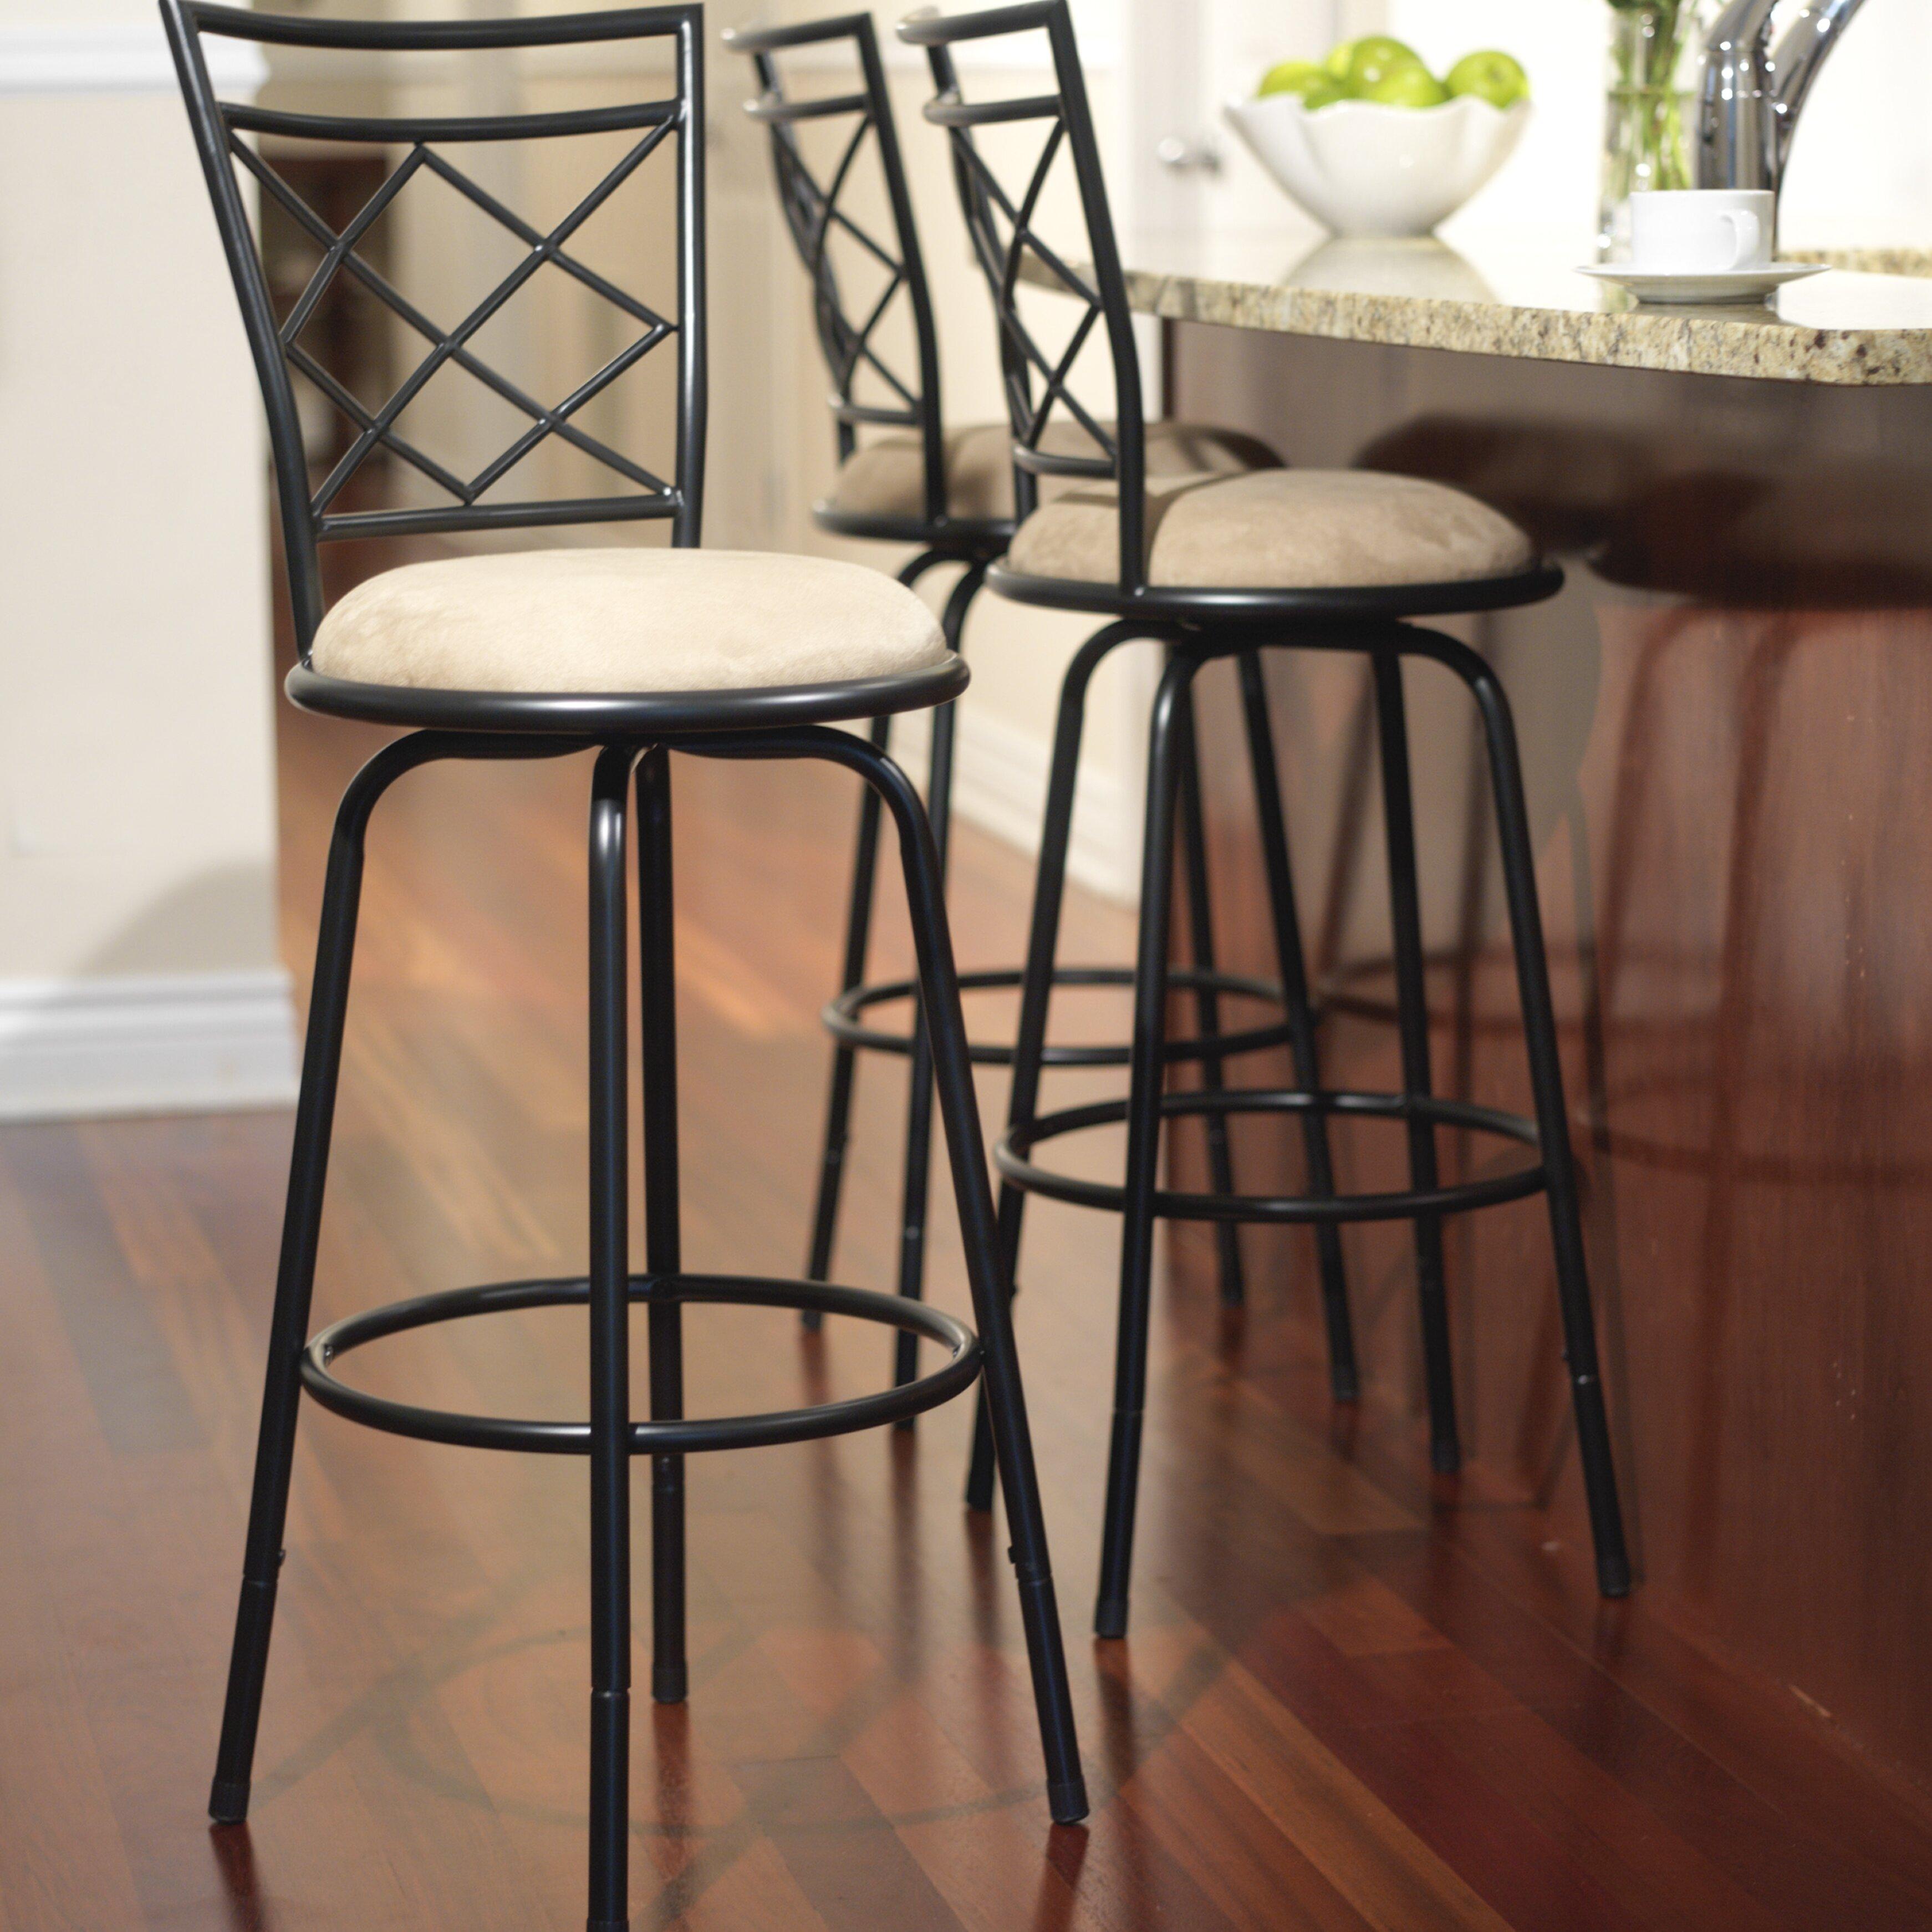 3 Adjustable Swivel Bar Stool Set Counter Height Kitchen: TMS Avery Adjustable Height Swivel Bar Stool & Reviews